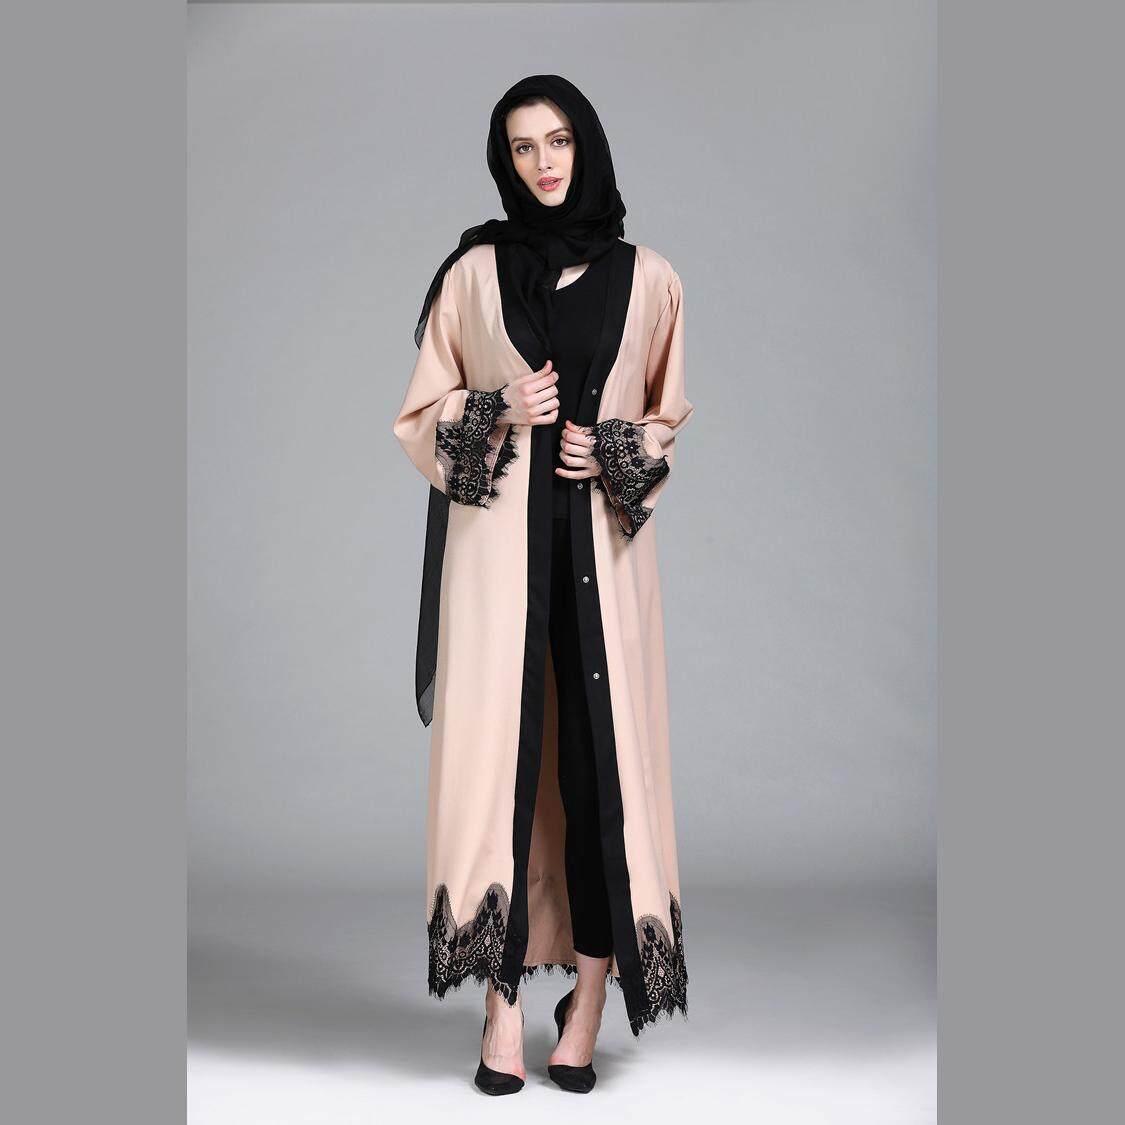 Features Fashion Muslim Dress Long Sleeve Women Arabic Dubai Abaya Anneyep Printed Flowers Kaftan Maxi New For Lace Islamic Turkish Clothing Djellaba Robe